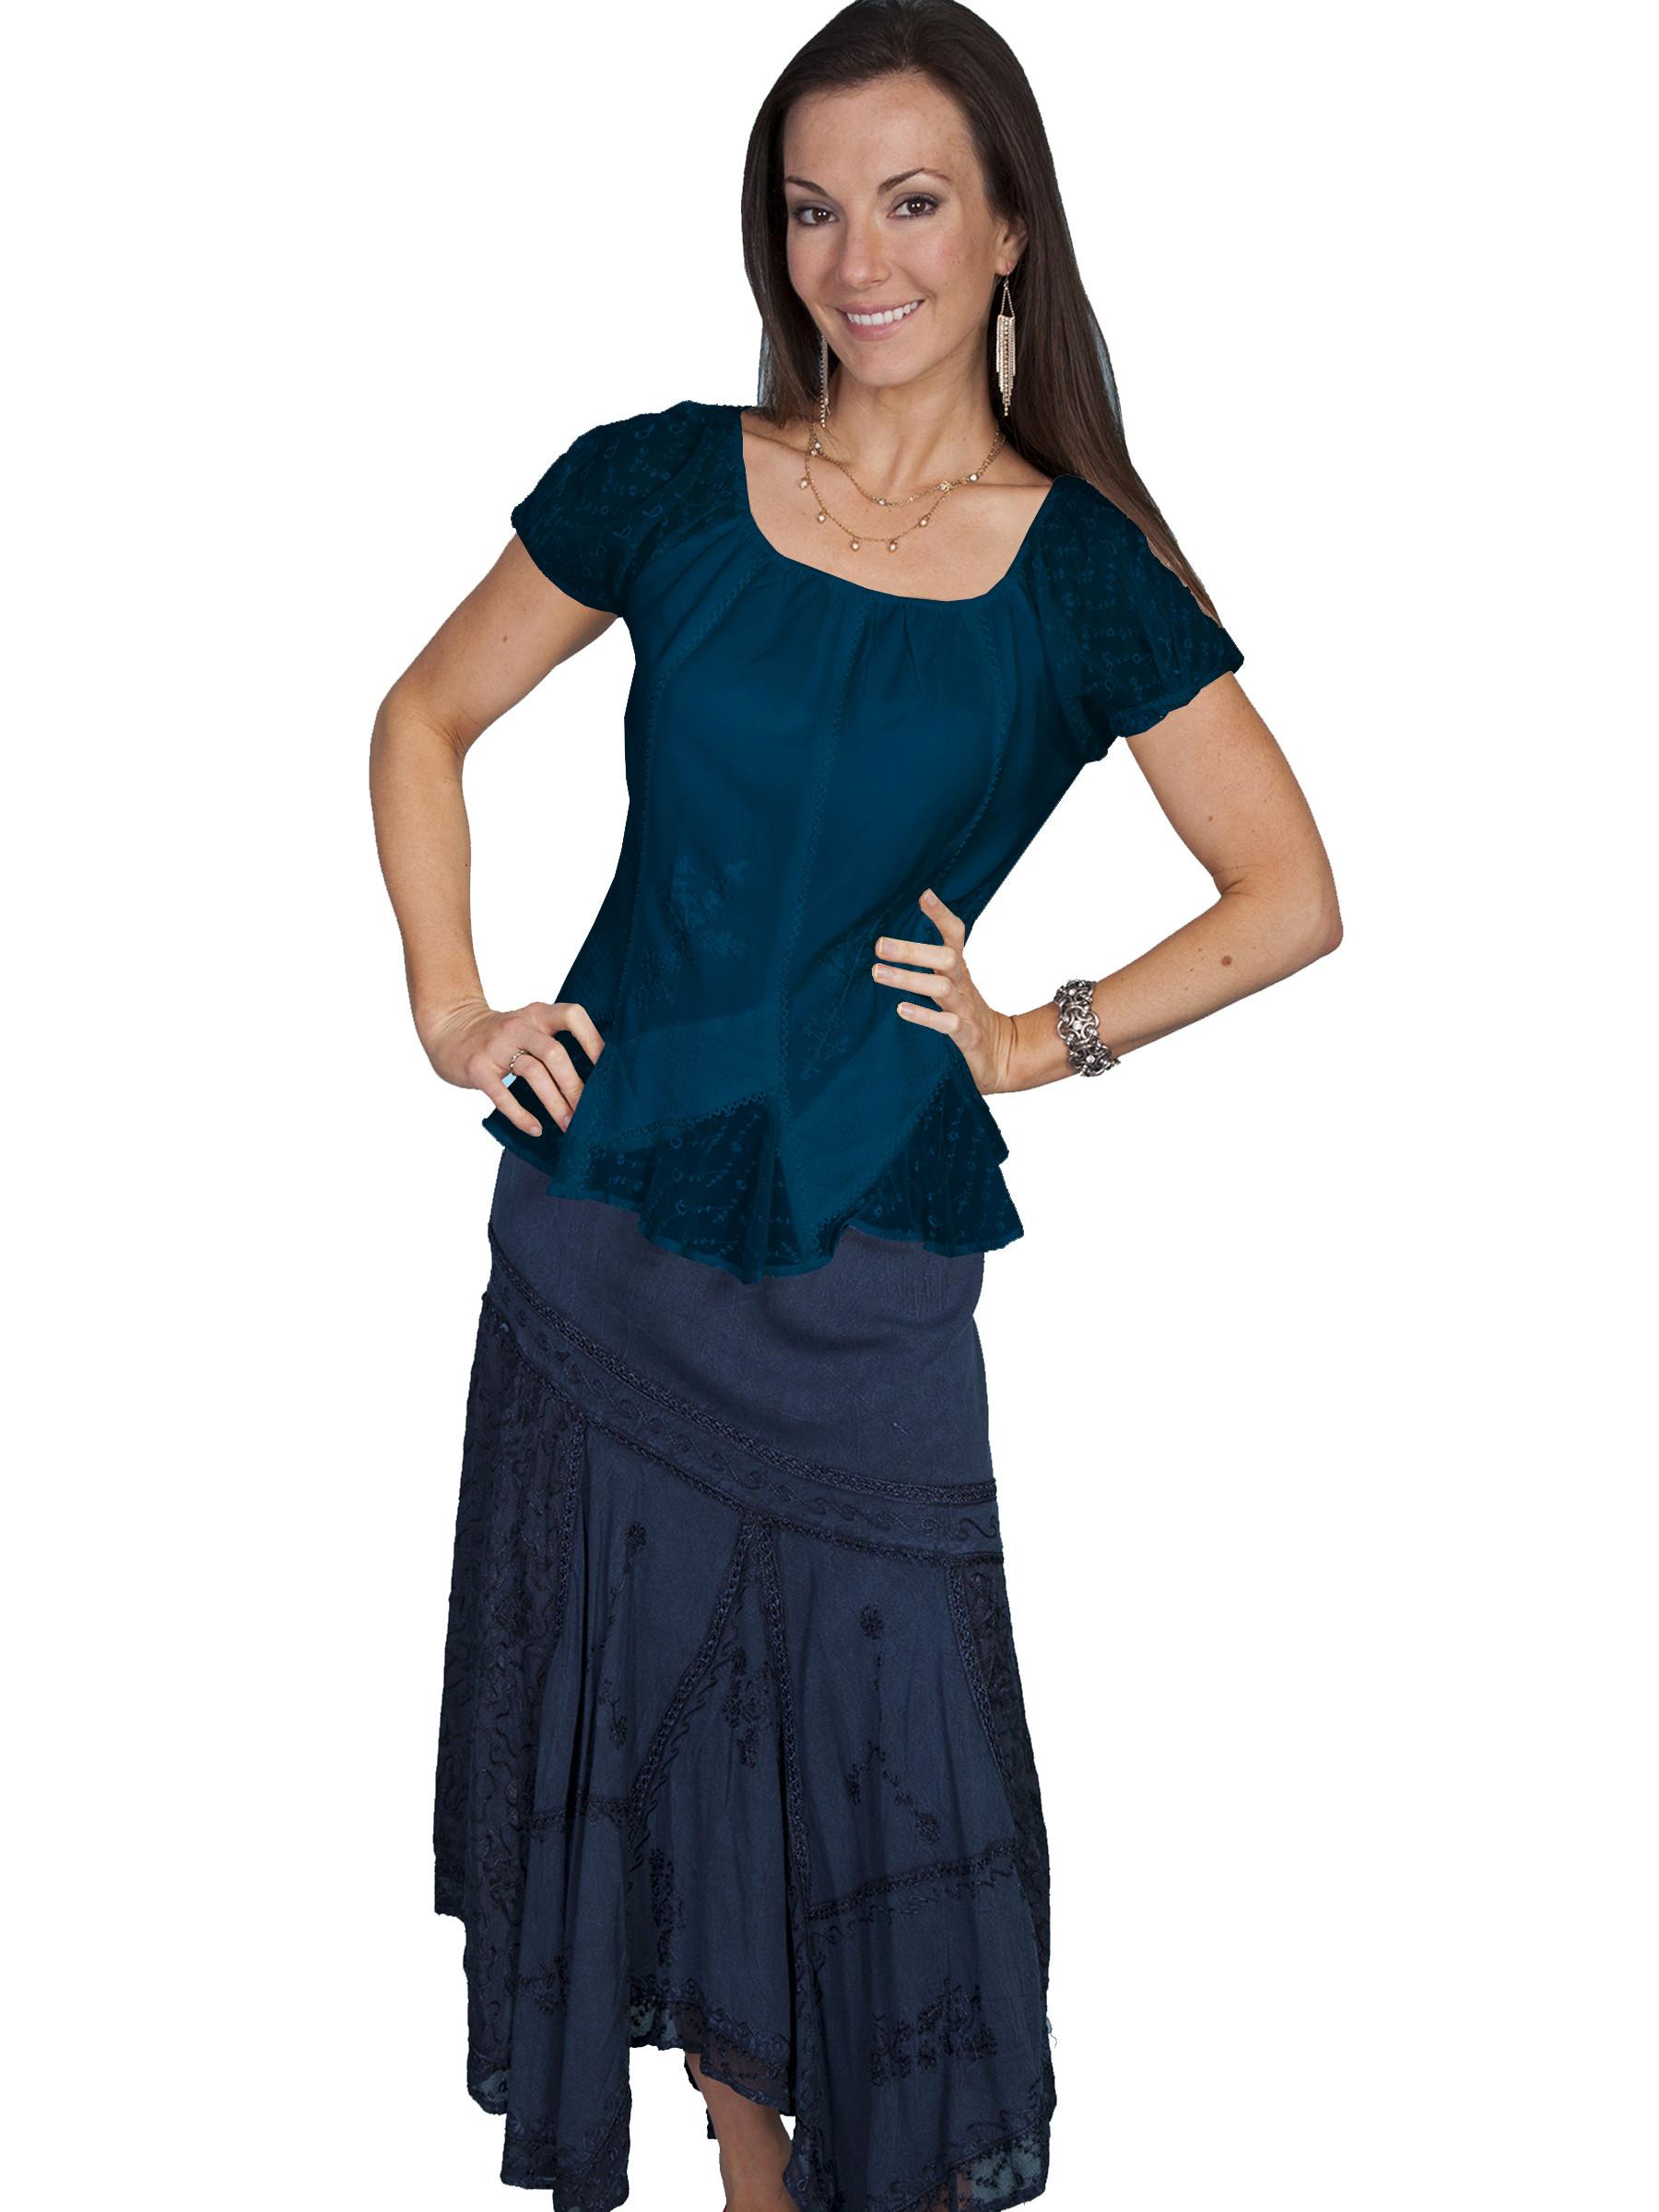 Plus Size Short Sleeve Blouses